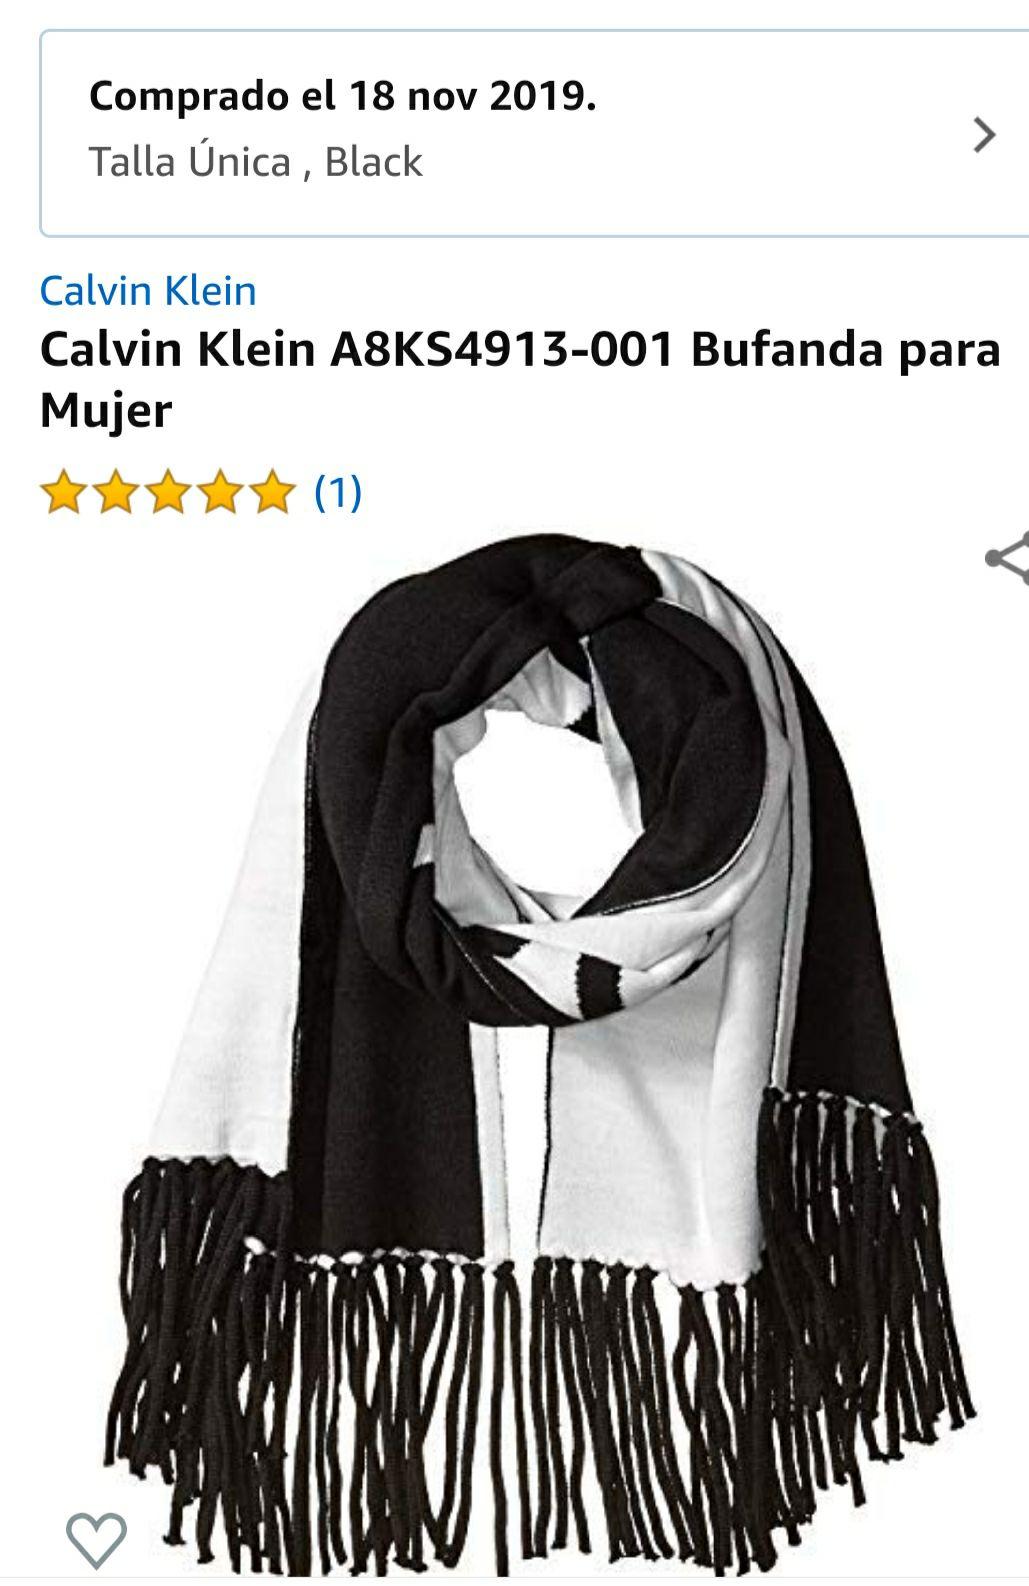 Amazon: Calvin Klein A8KS4913-001 Bufanda para Mujer